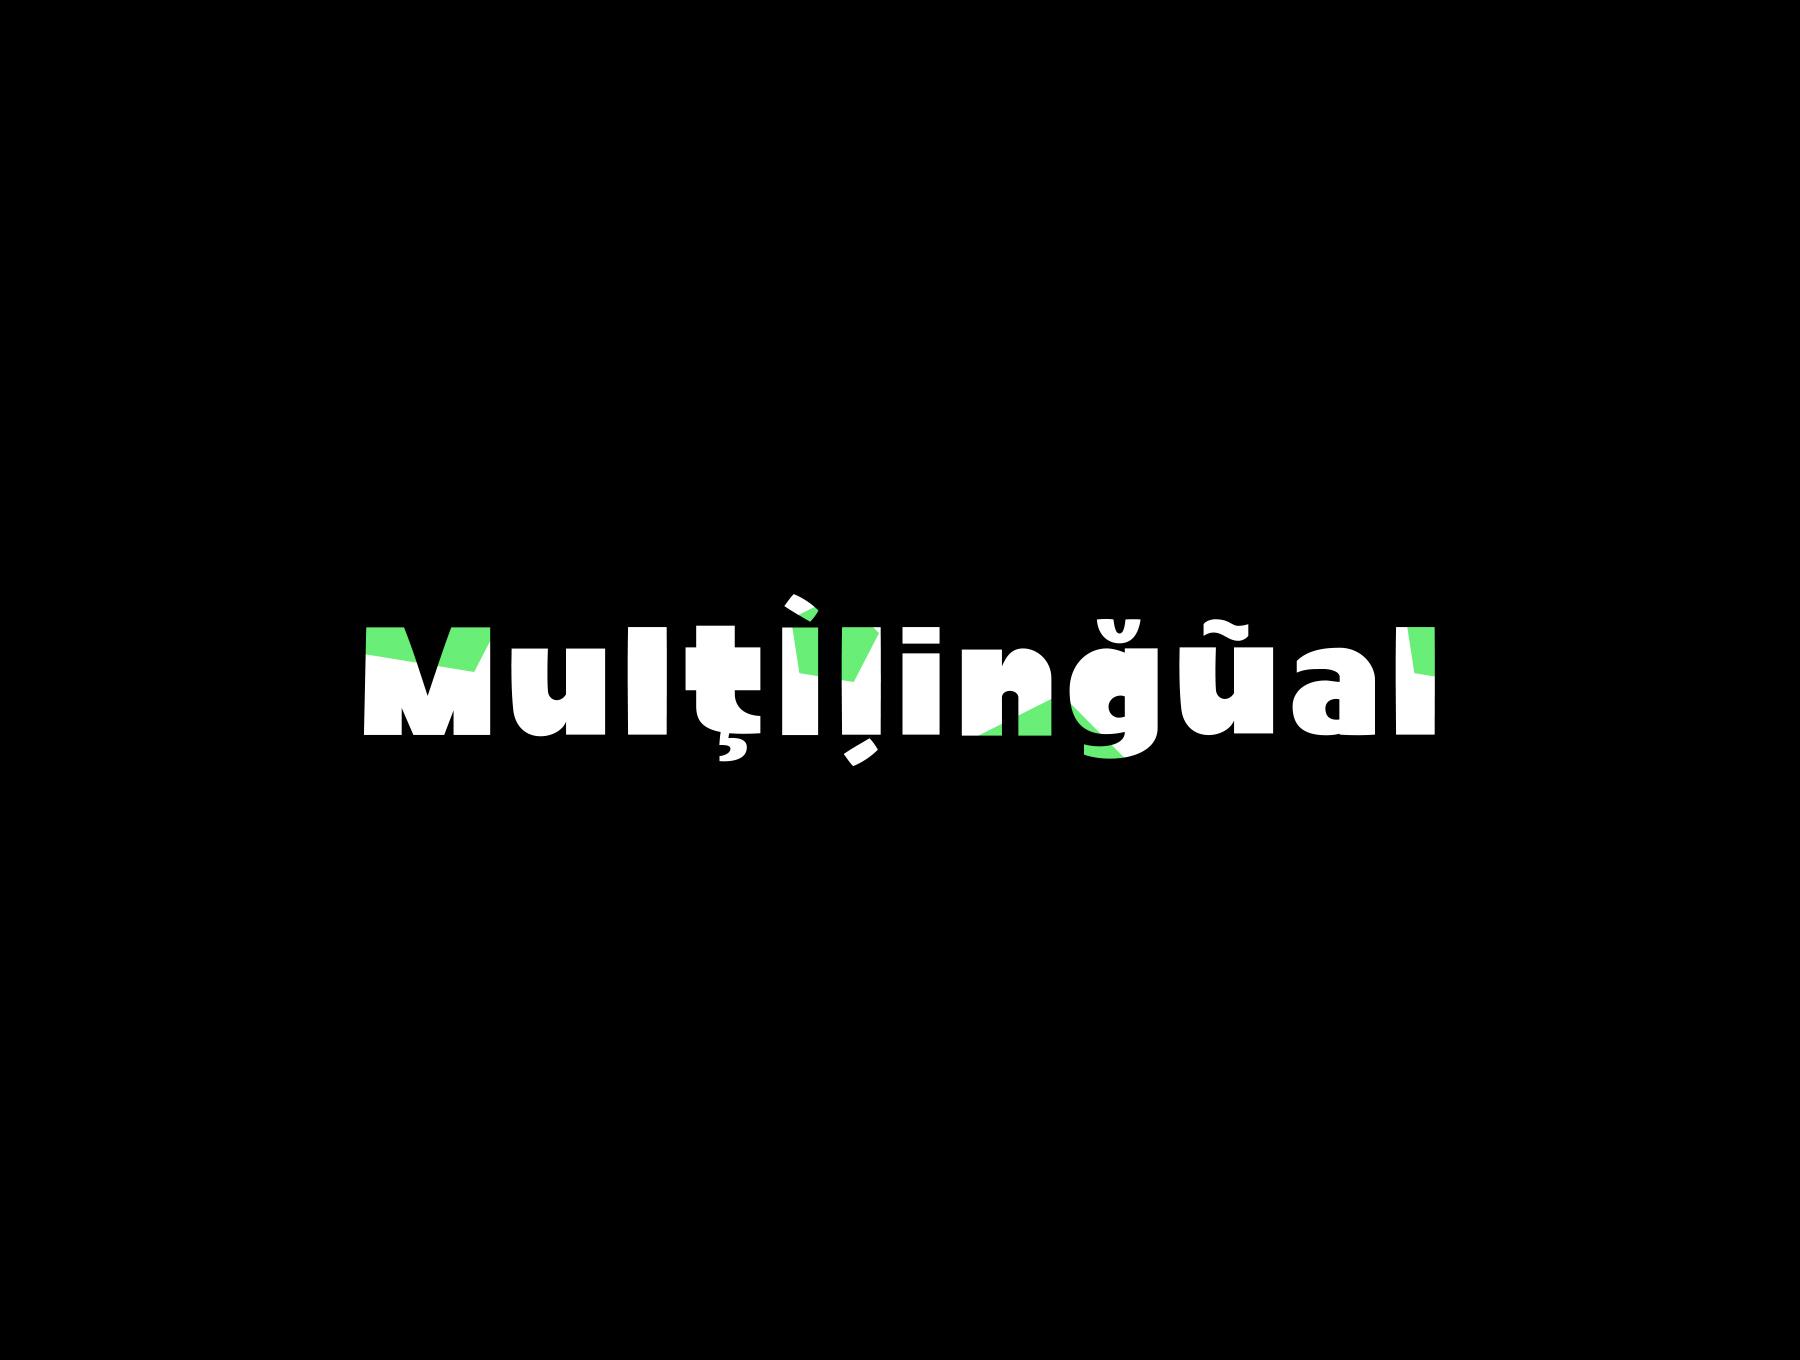 Semlor Free Font - sans-serif